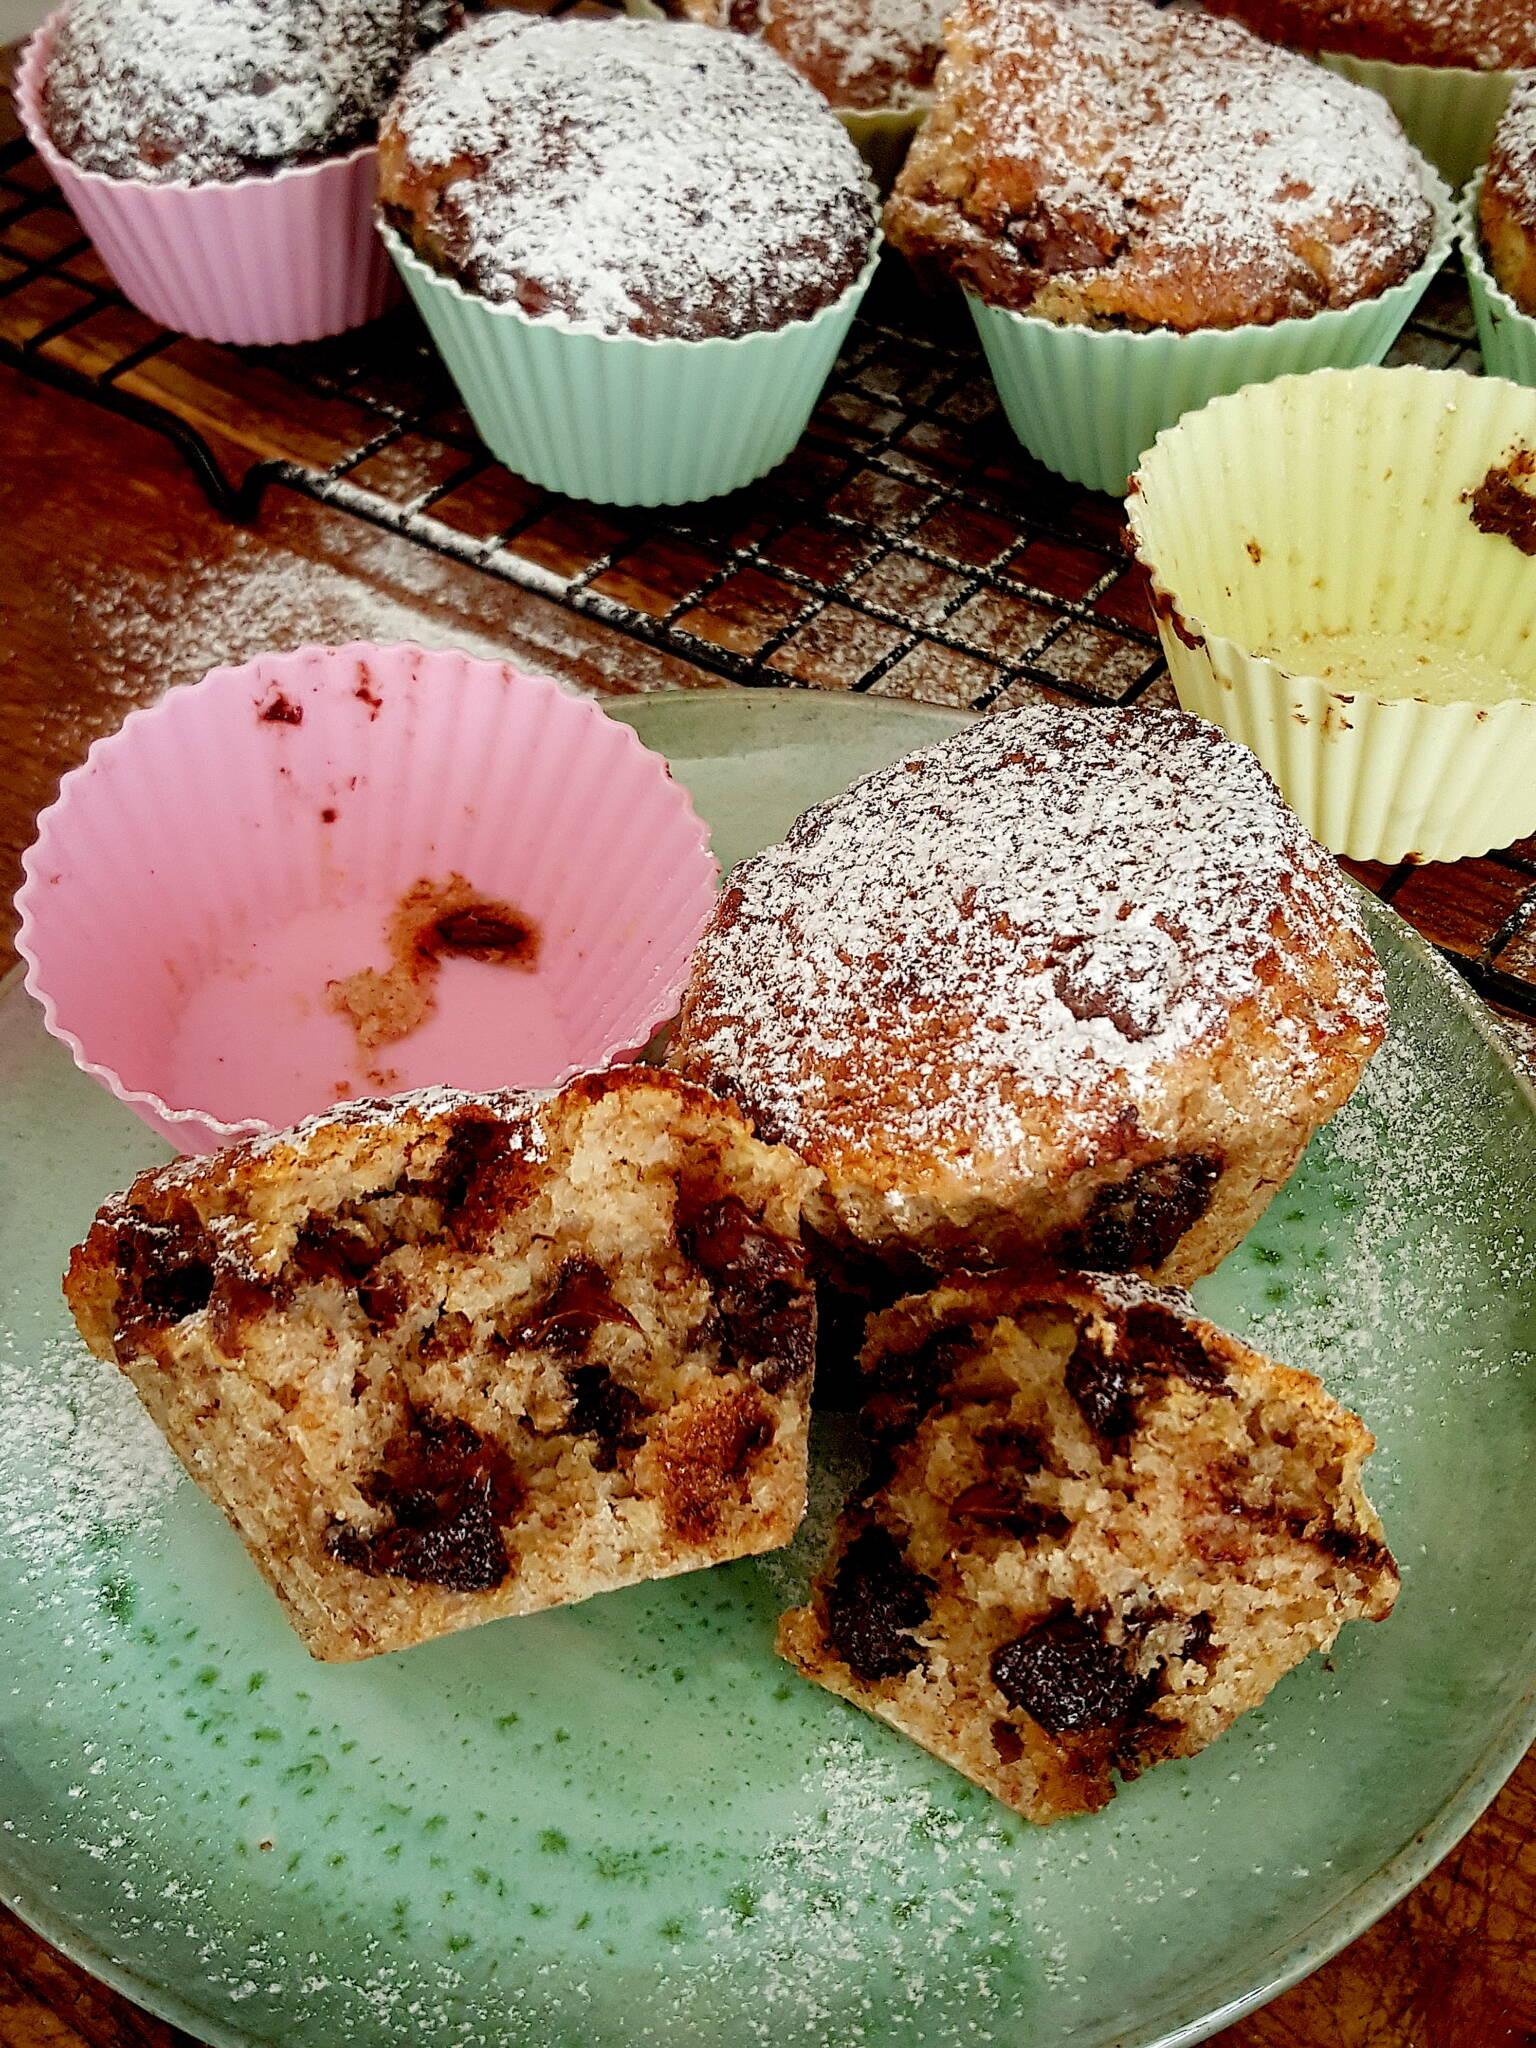 Banana & Chocolate Drop Muffins